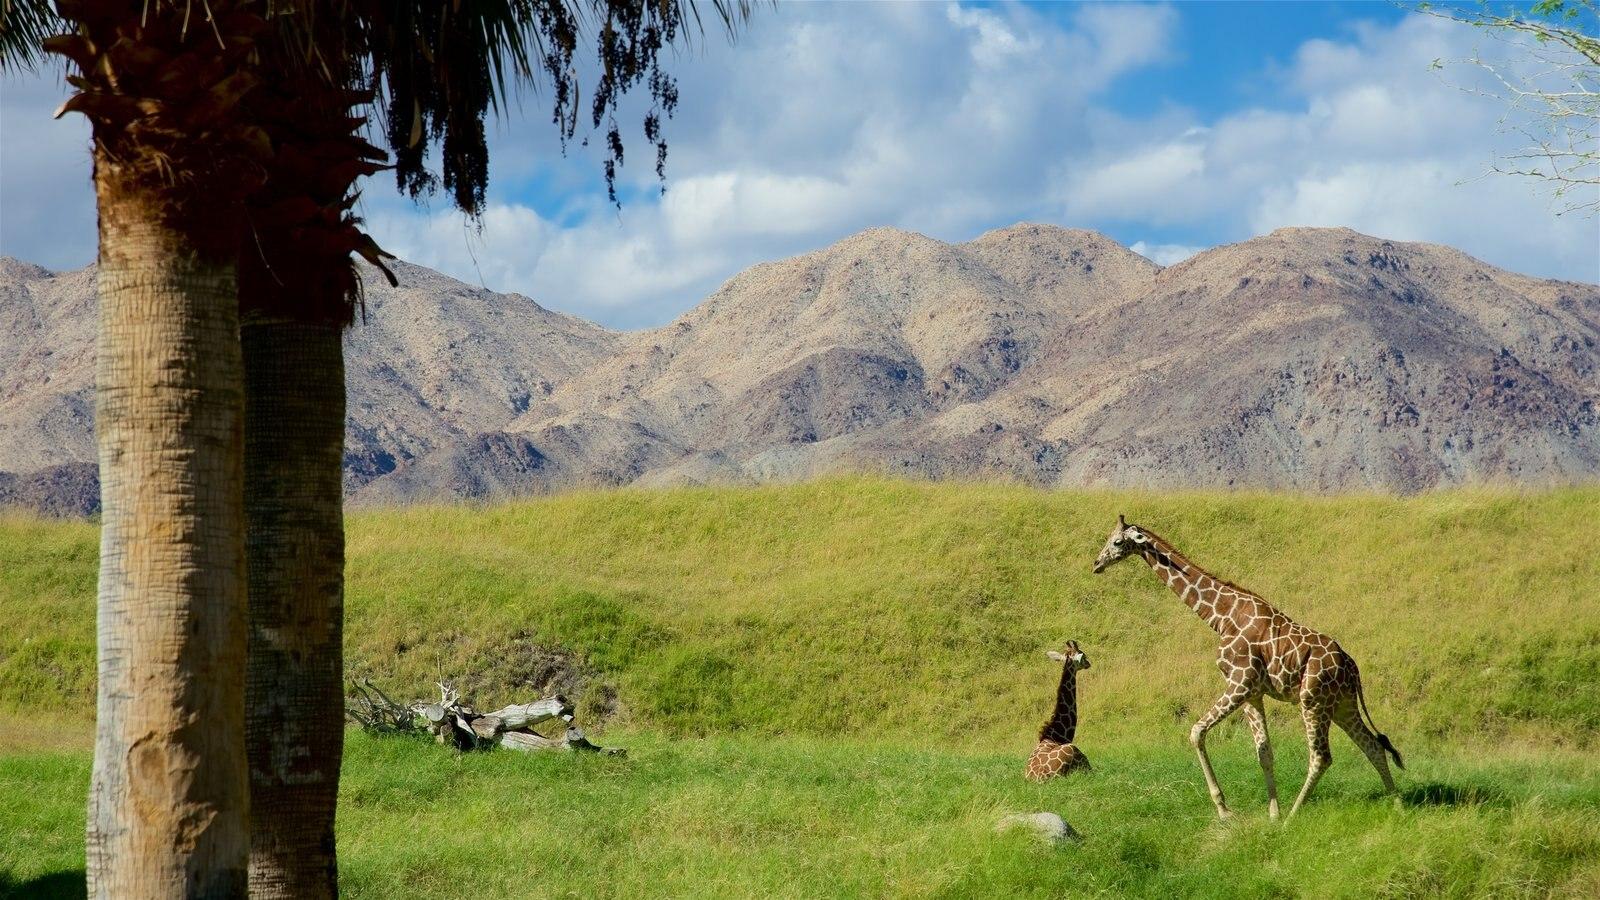 Zoológico y jardines Living Desert que incluye un parque, animales del zoológico y animales peligrosos